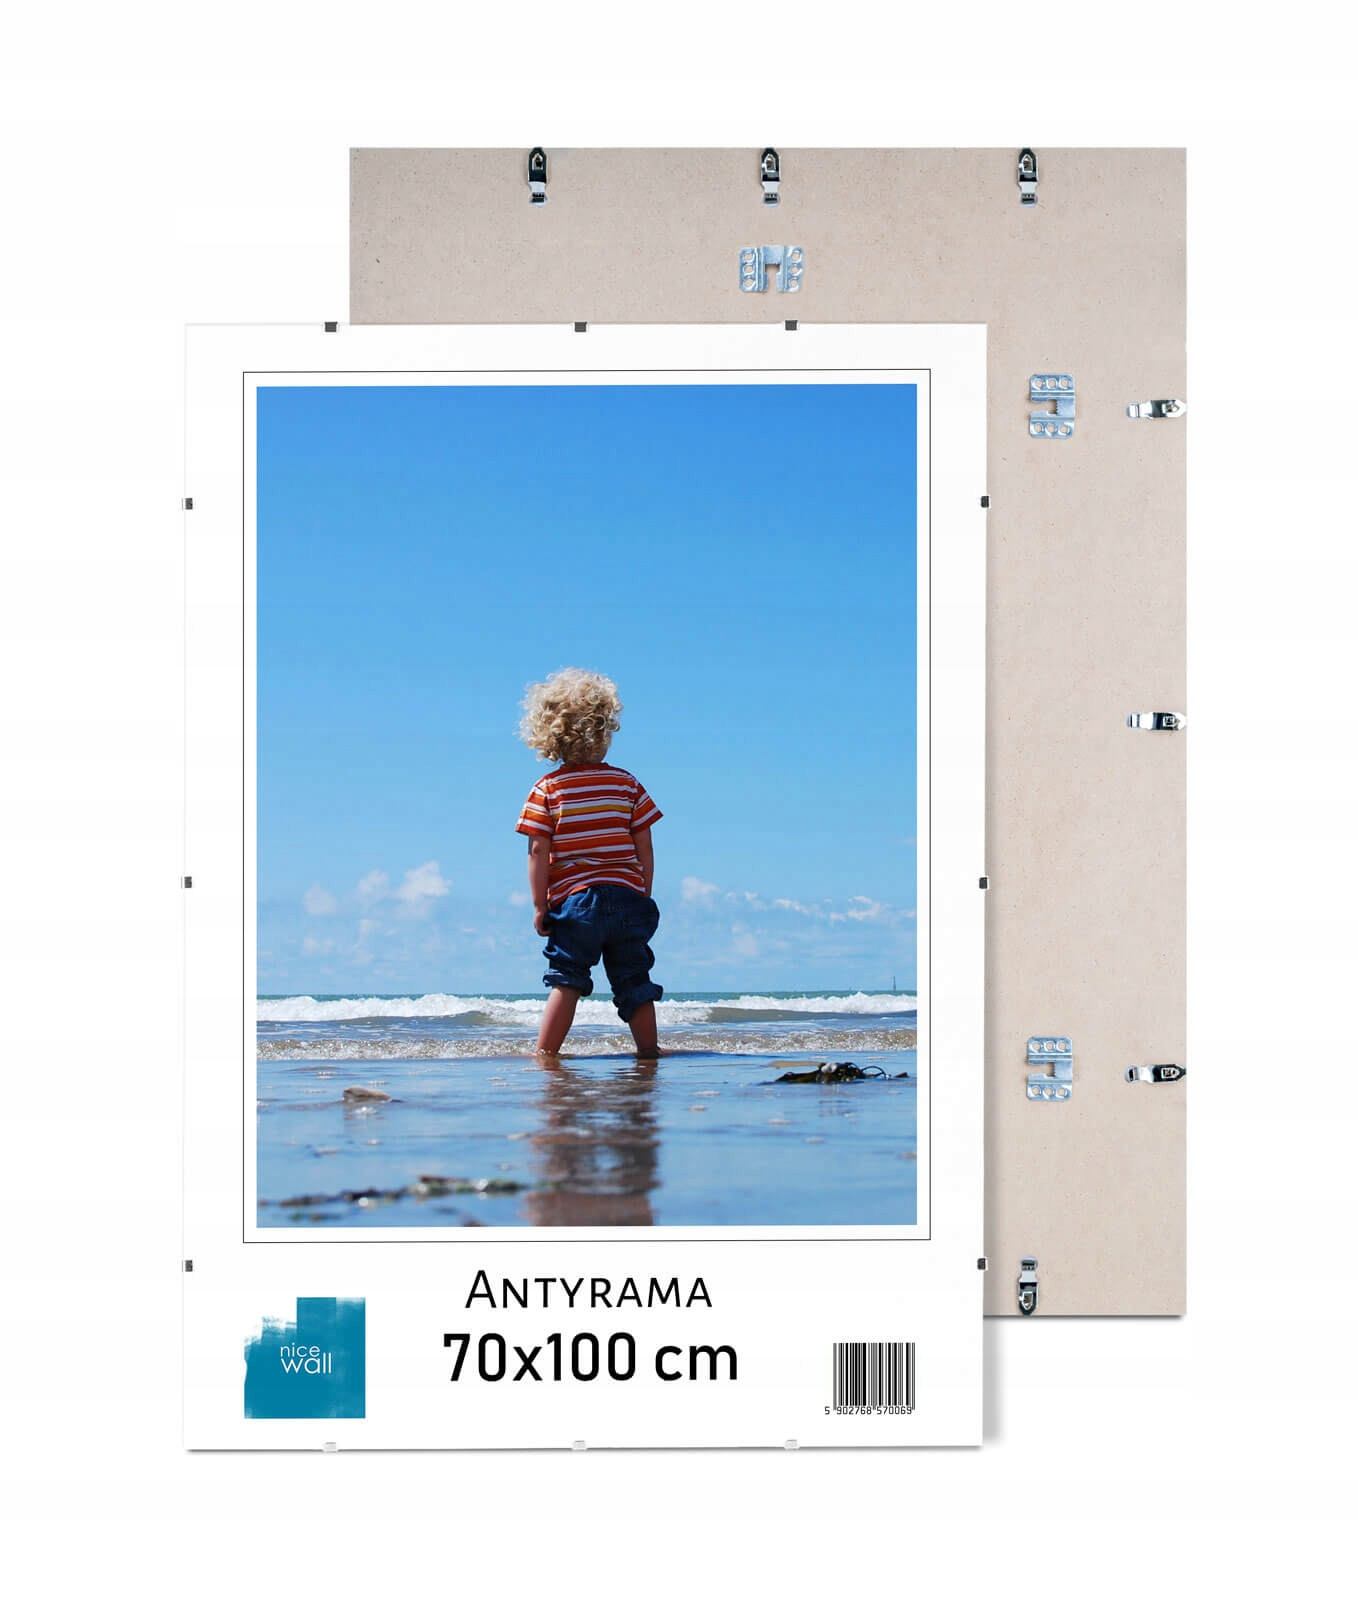 Antirama 100x70 cm Antirami 70x100 cm Formát B1